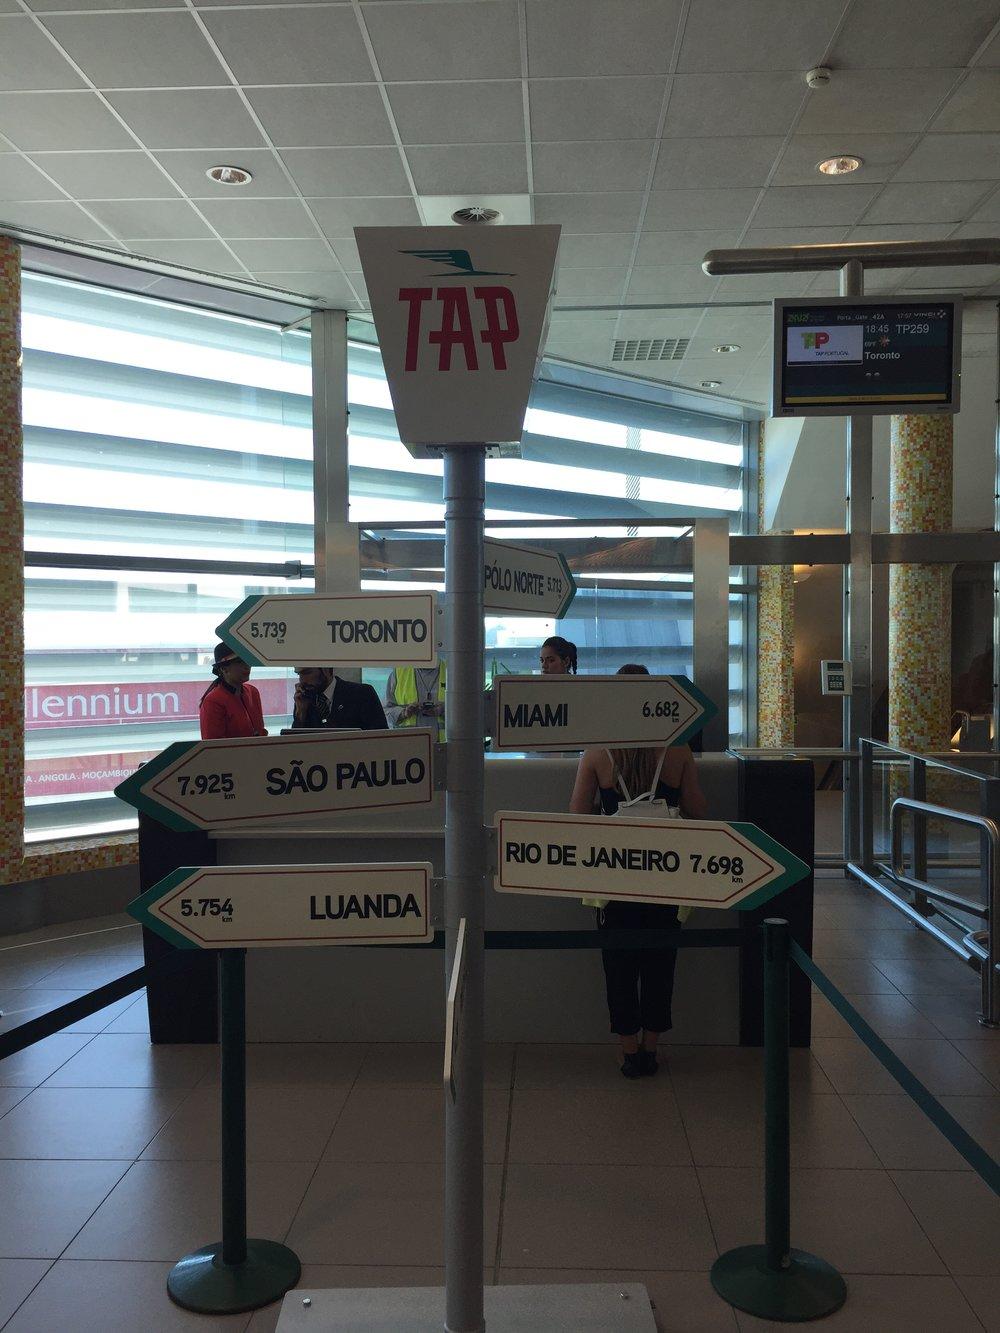 Lisbon airport TAP.JPG